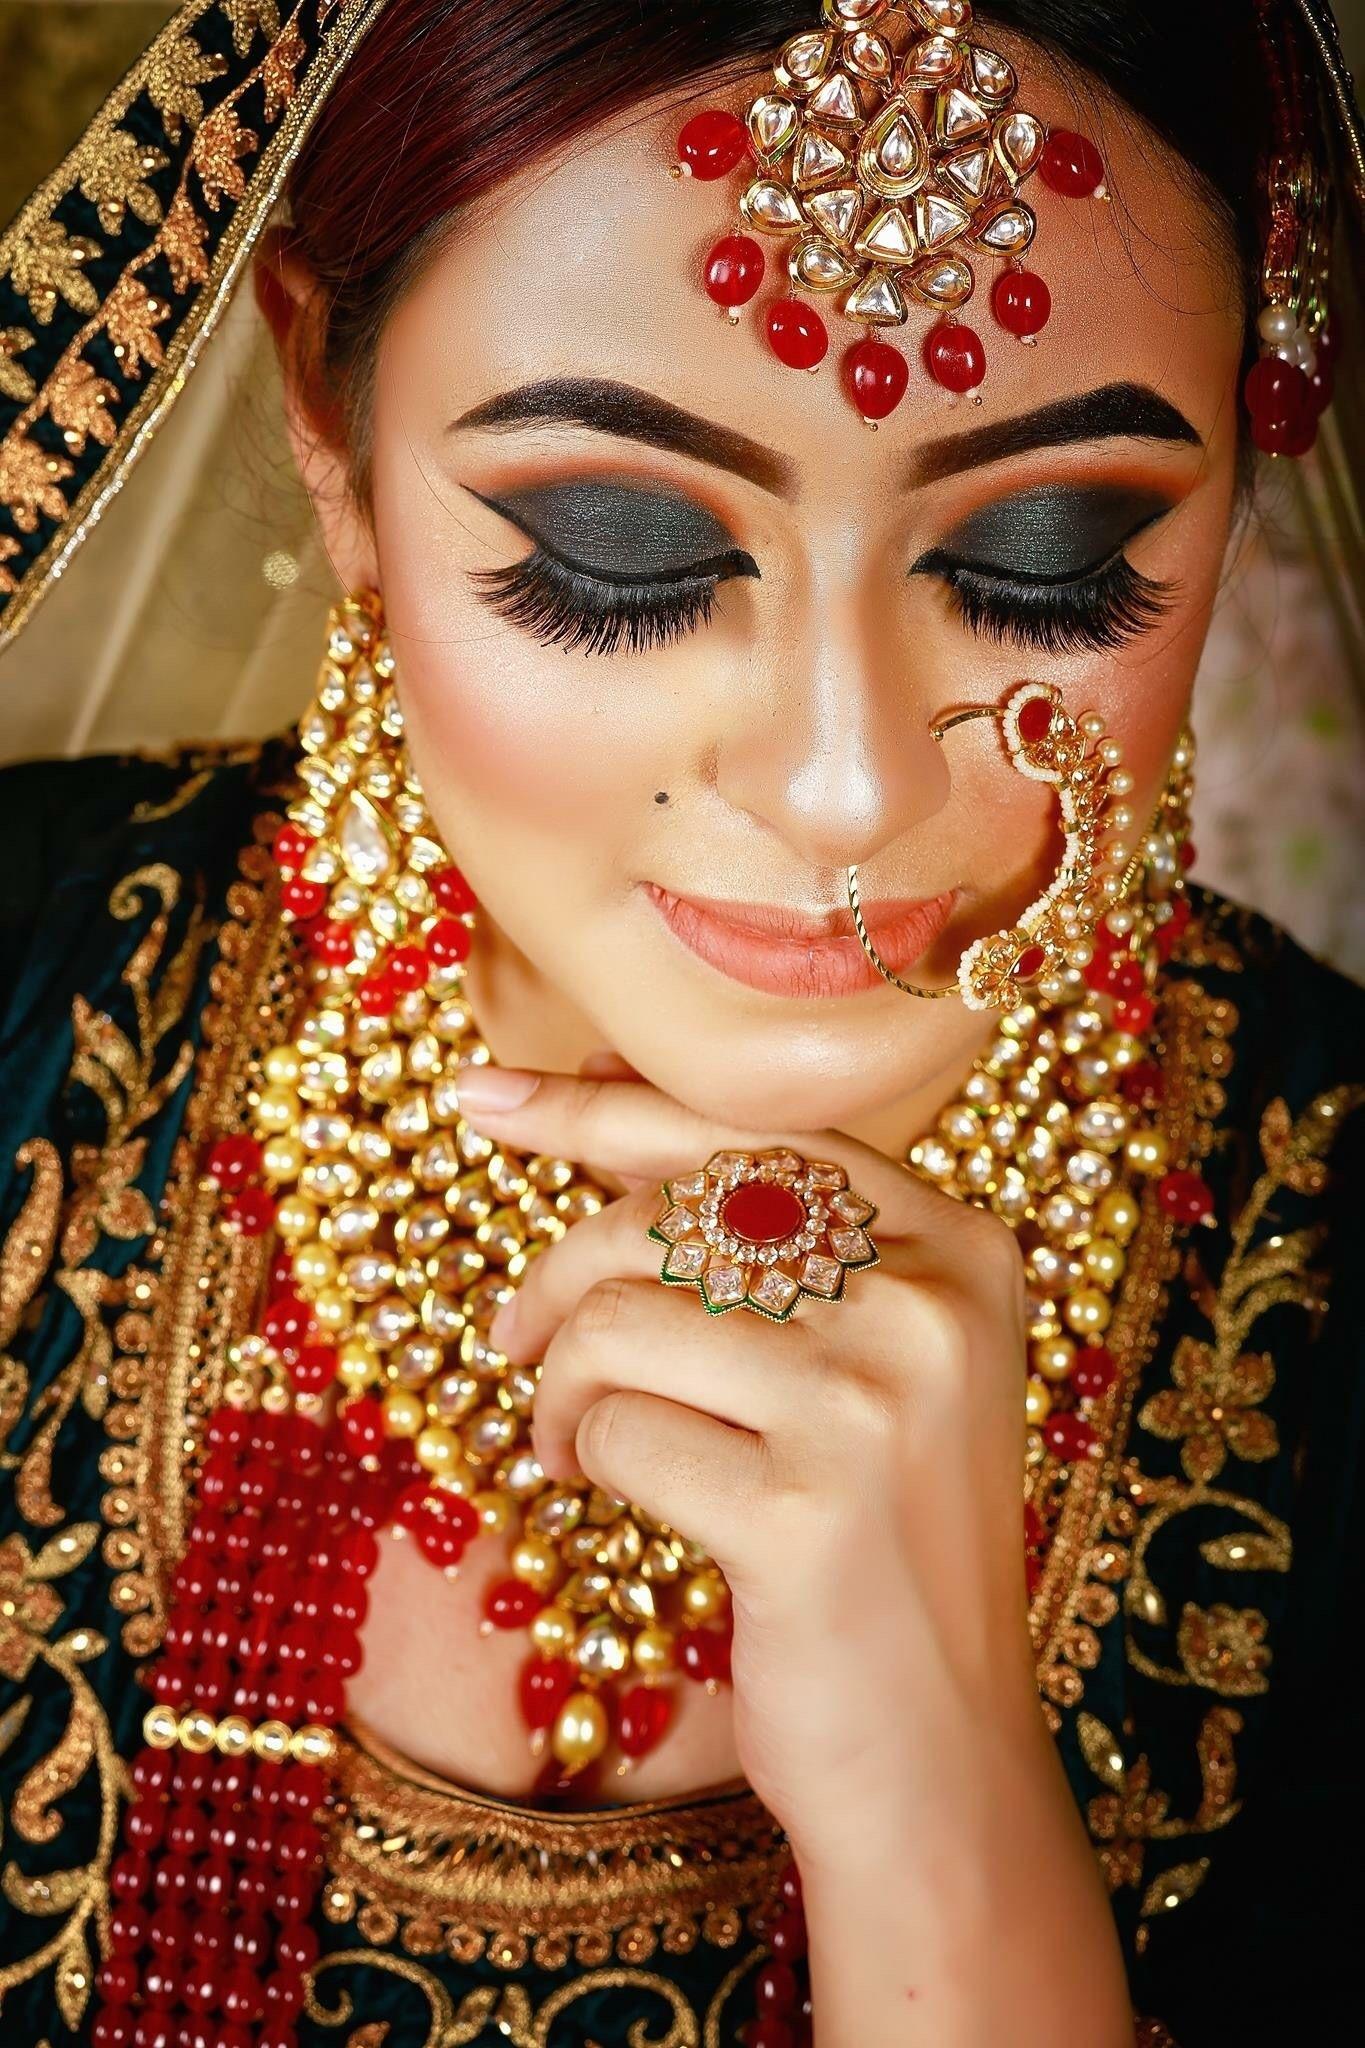 Airbrush Makeover By Chesta | Airbrush Makeup, Hd Makeup throughout Bridal Makeup Hd Pic